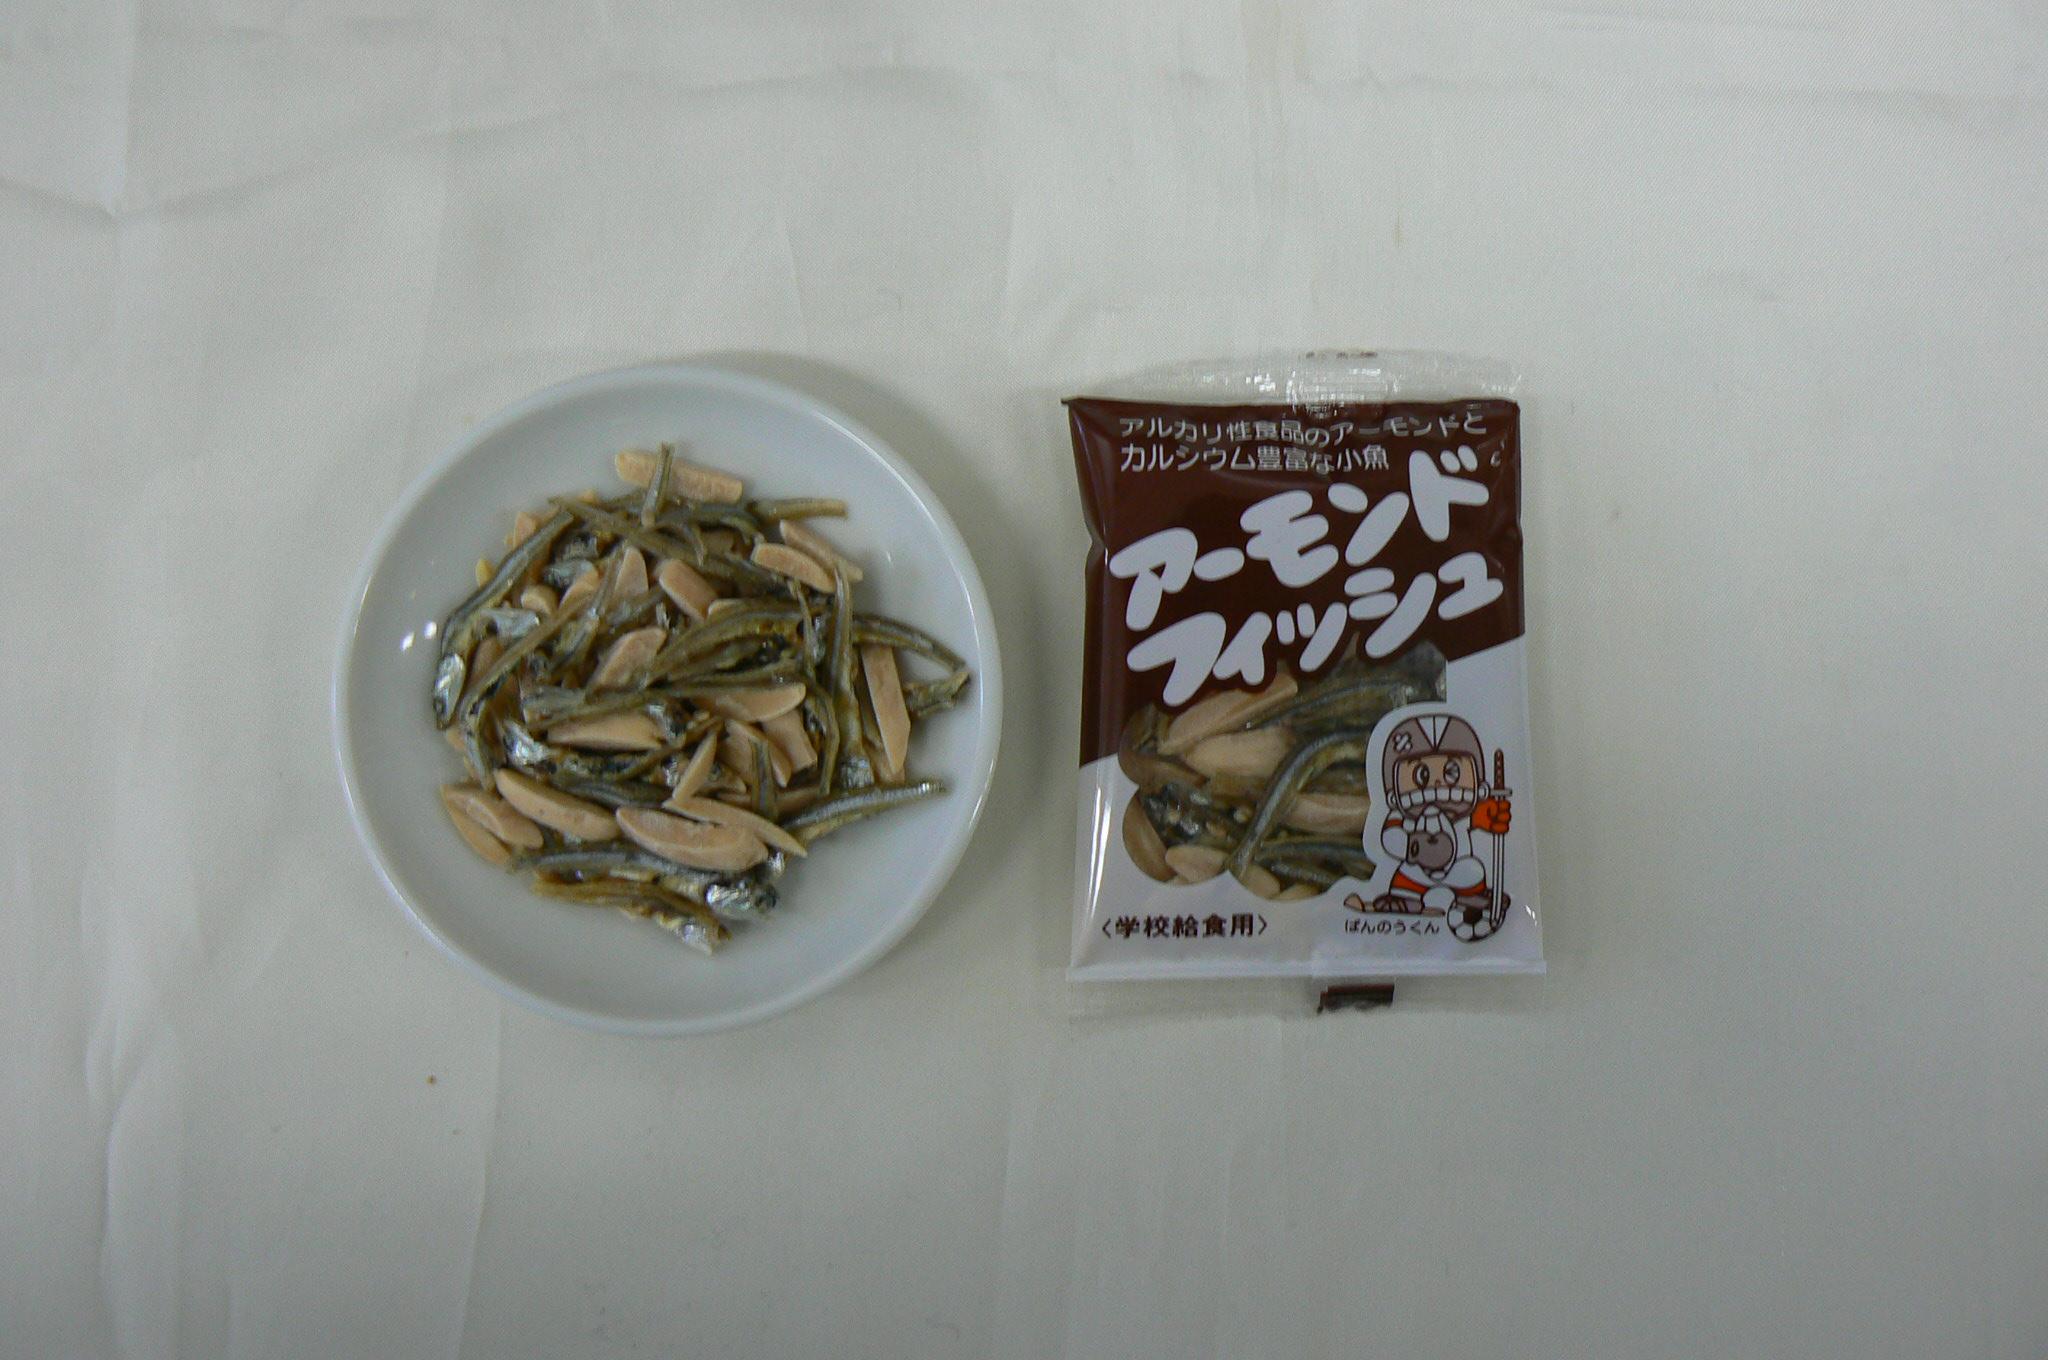 http://www.dotrakuichi.com/tonya/product/image/2021_F0001_4.jpg